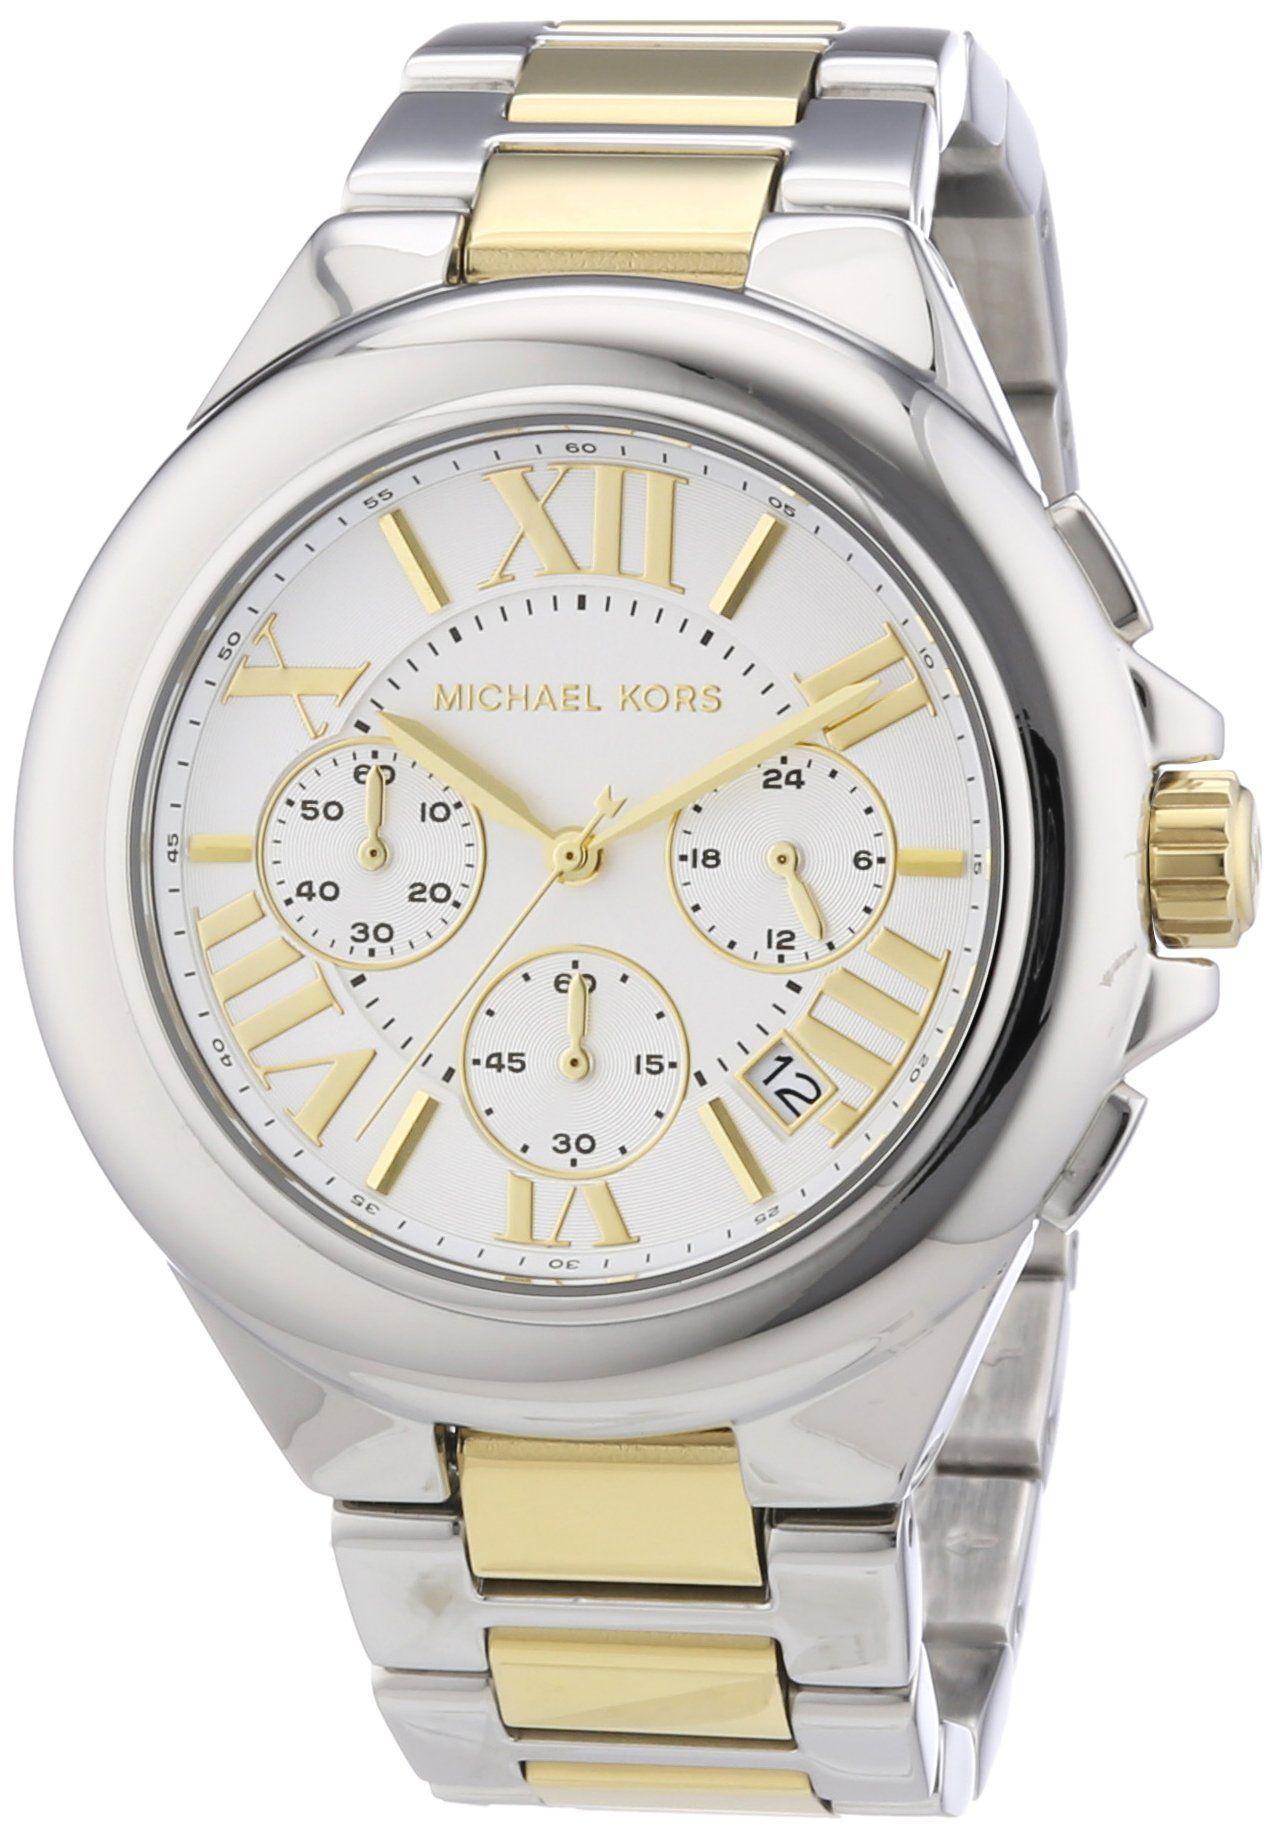 8171553ced60 Michael Kors MK5653 Ladies Two Tone Chronograph Watch